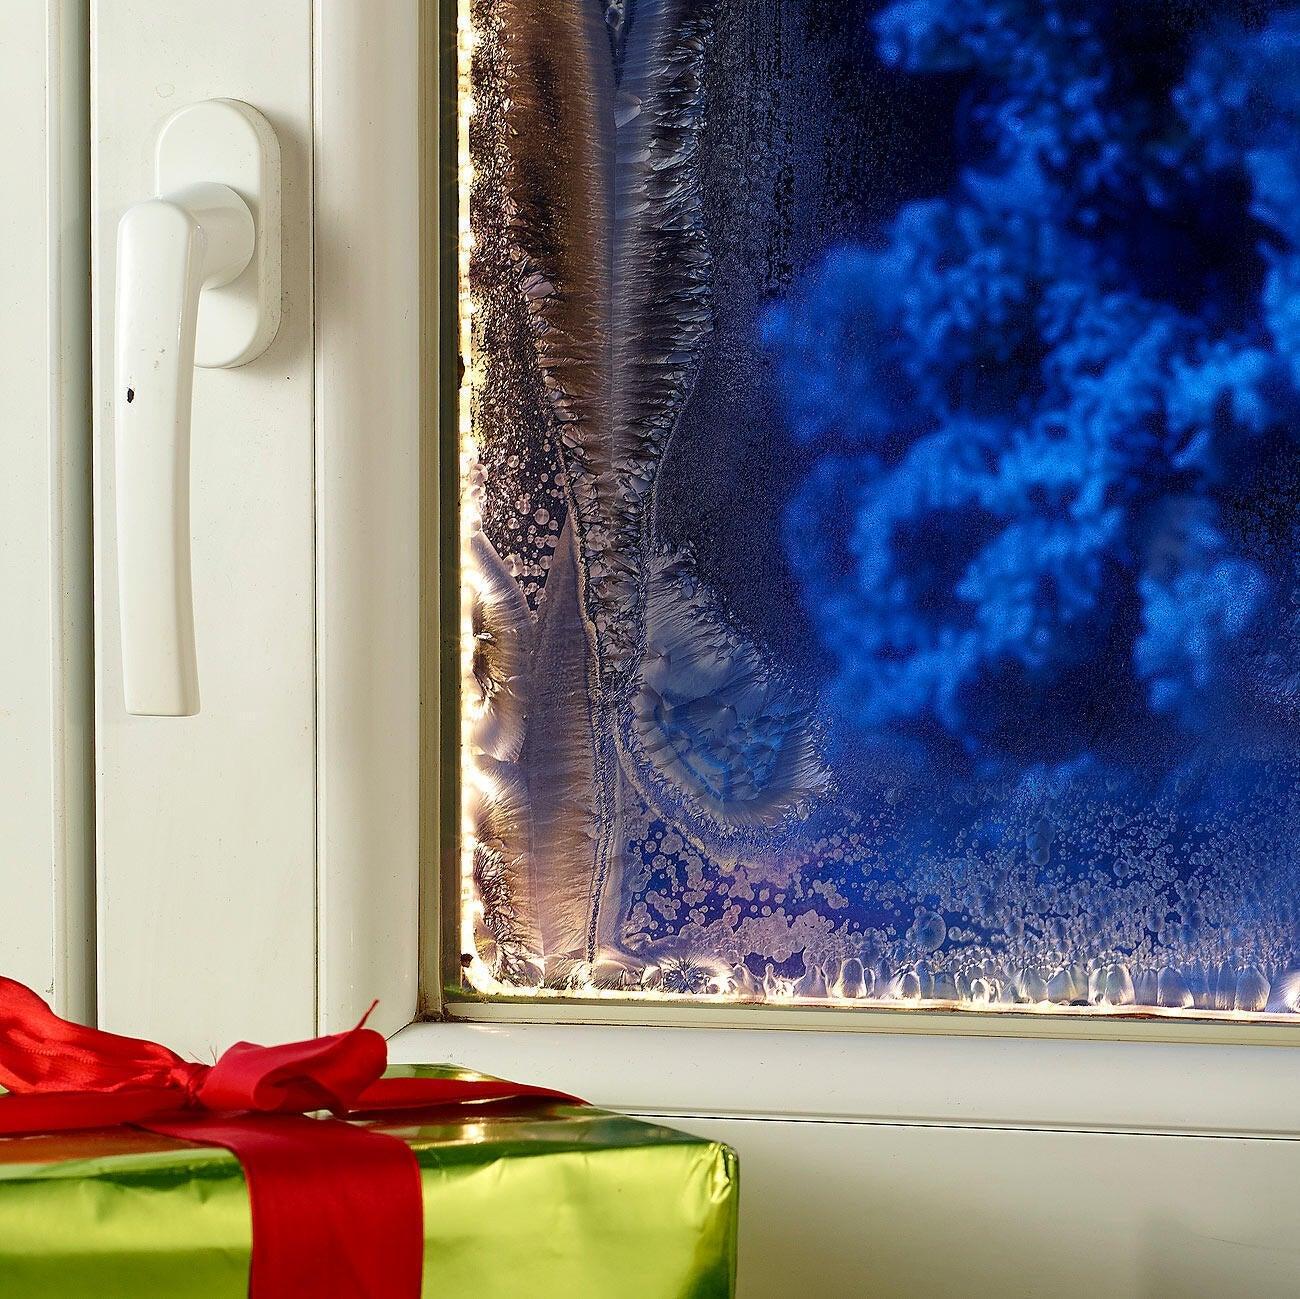 Striscia led Double bed 1.2m luce bianco caldo 250LM IP20 - 1